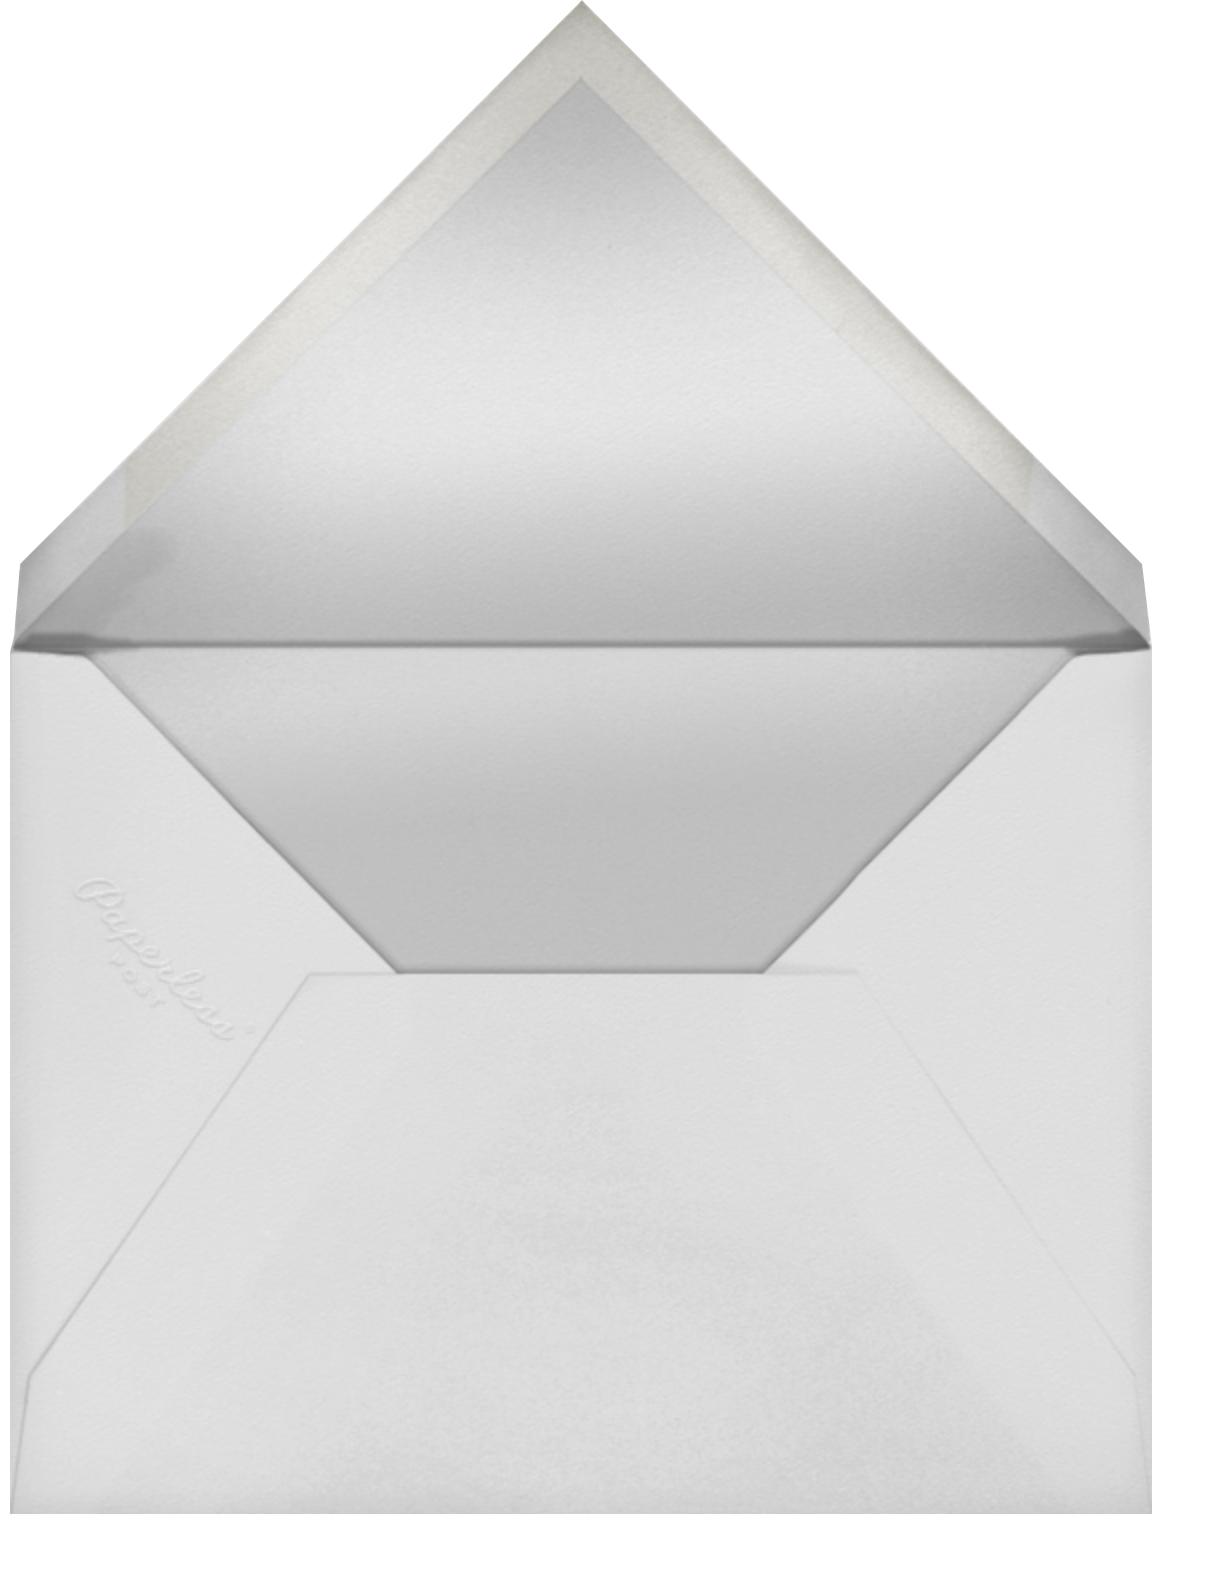 Ikat Dot (Program) - Light Pink - Oscar de la Renta - Menus and programs - envelope back